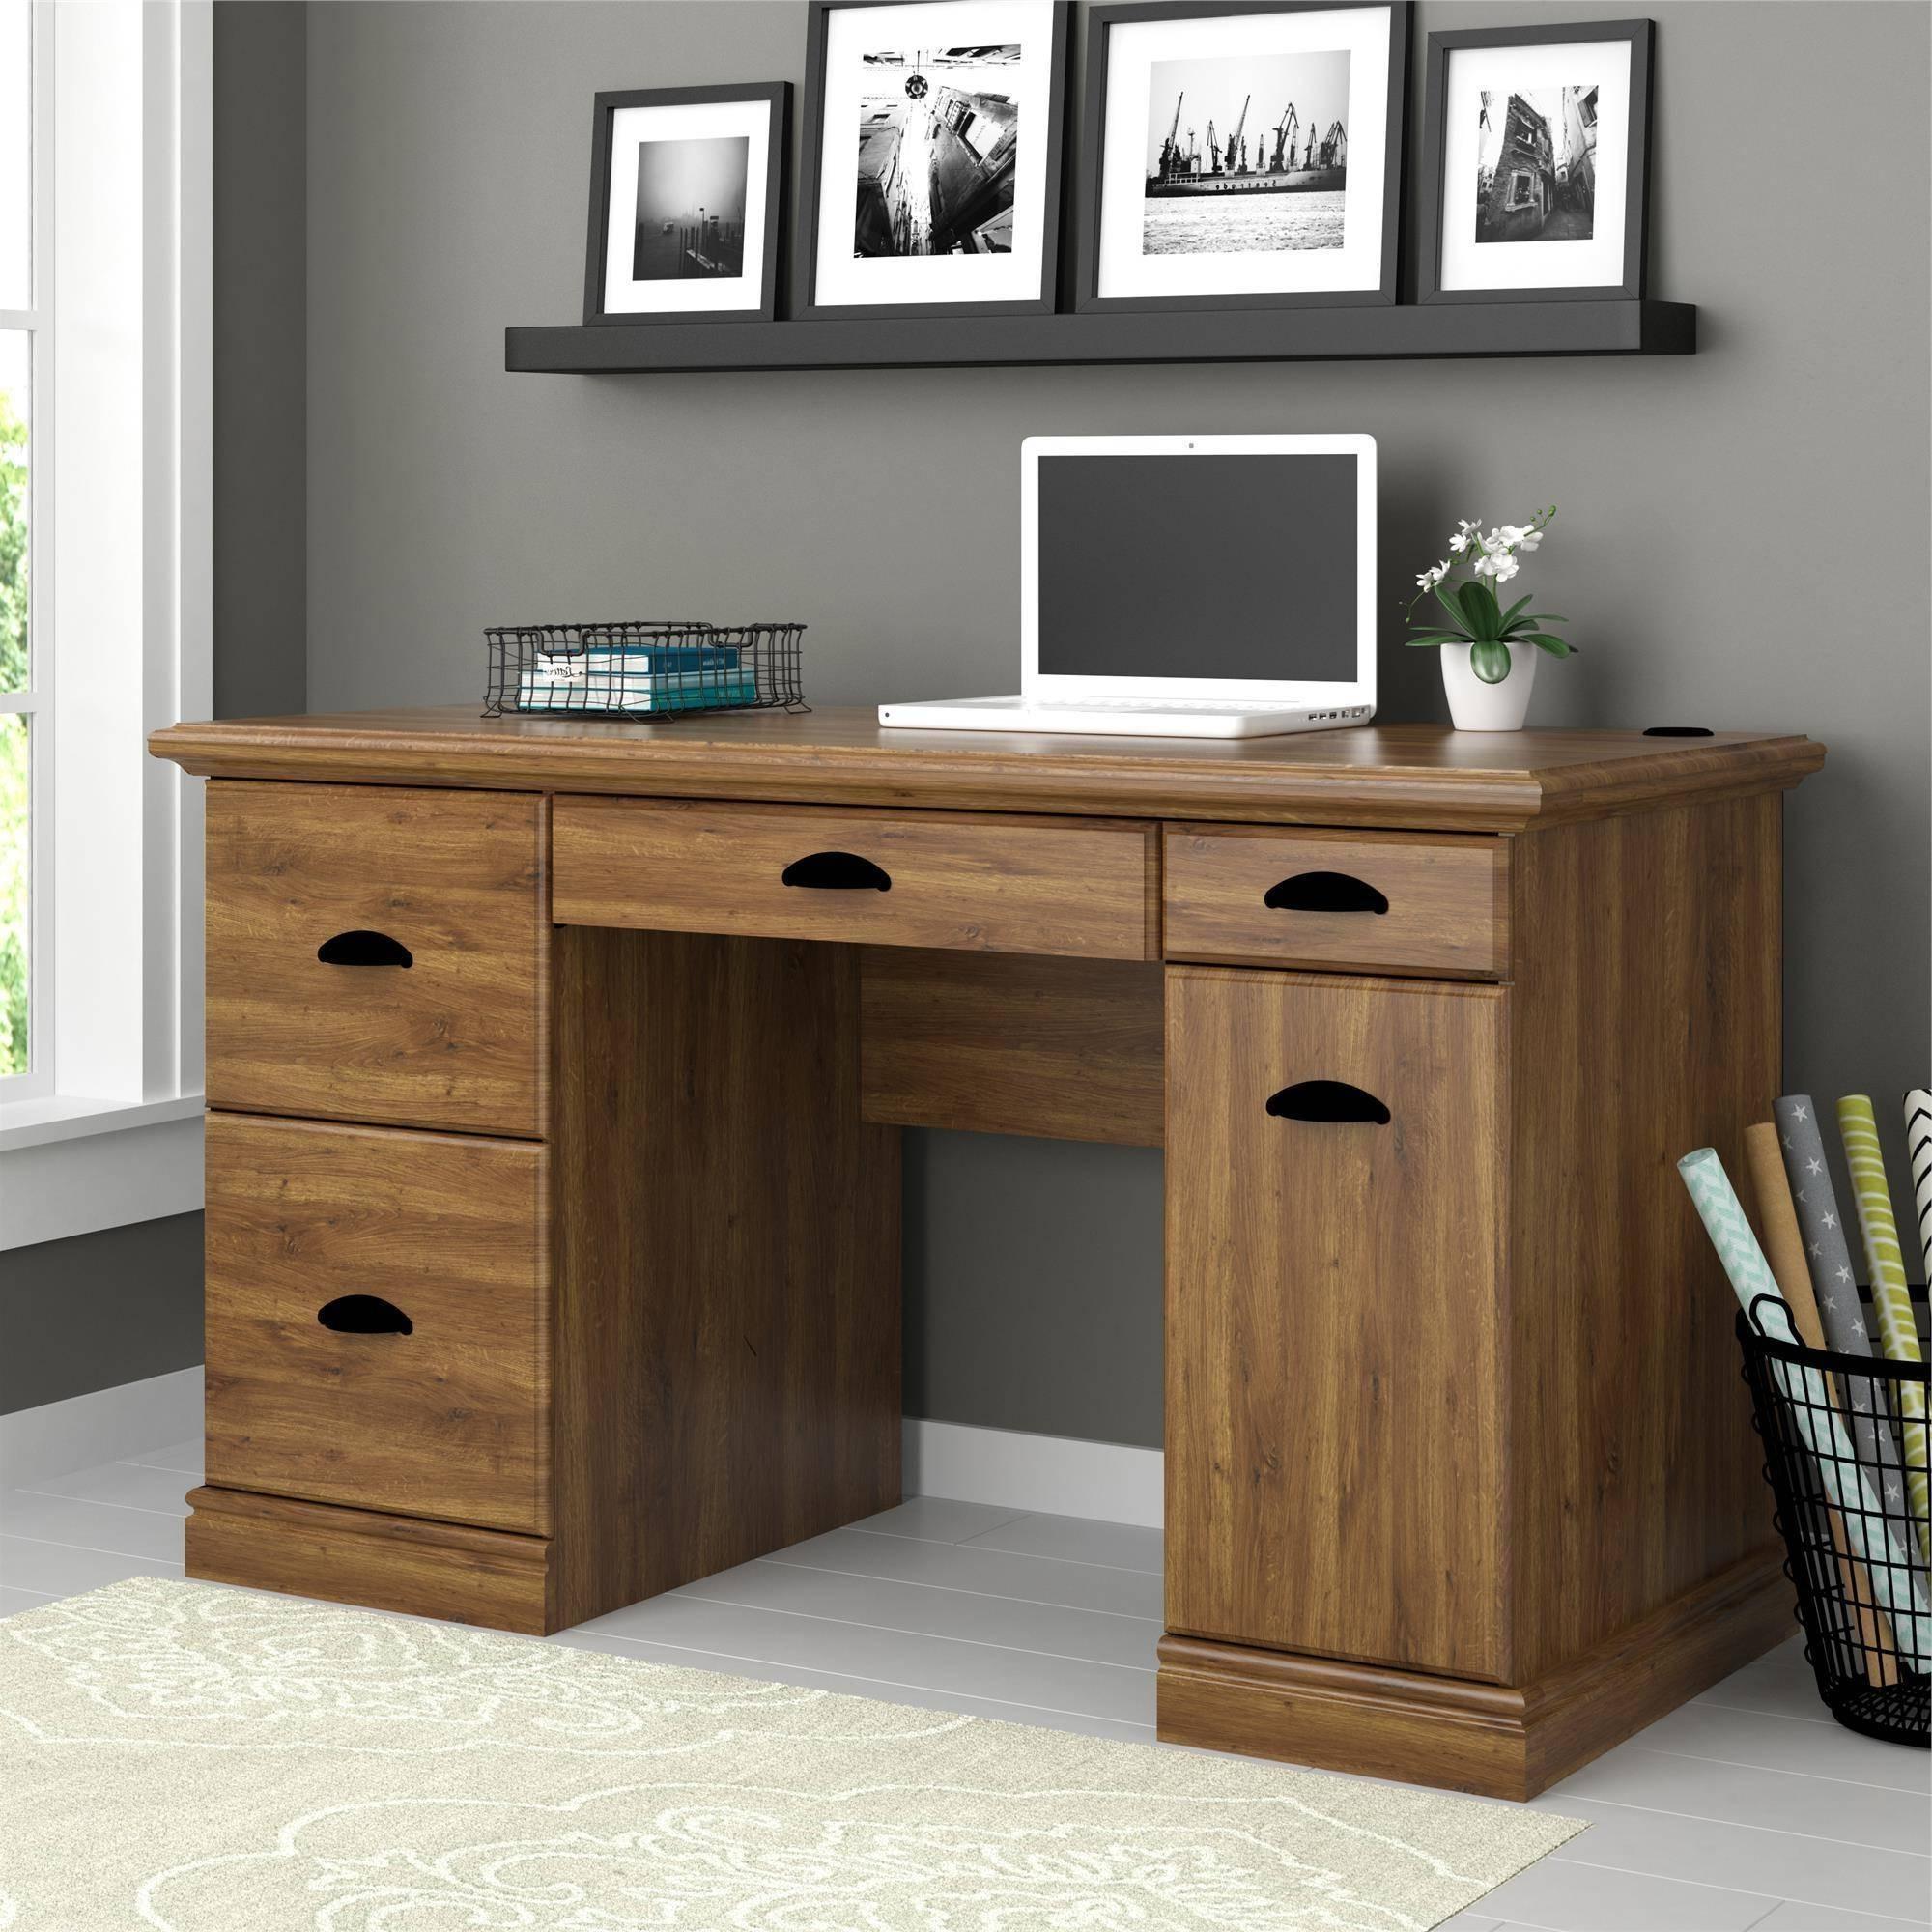 Computer Desks With Drawers Regarding Most Popular Better Homes And Gardens Computer Desk, Brown Oak – Walmart (View 2 of 20)